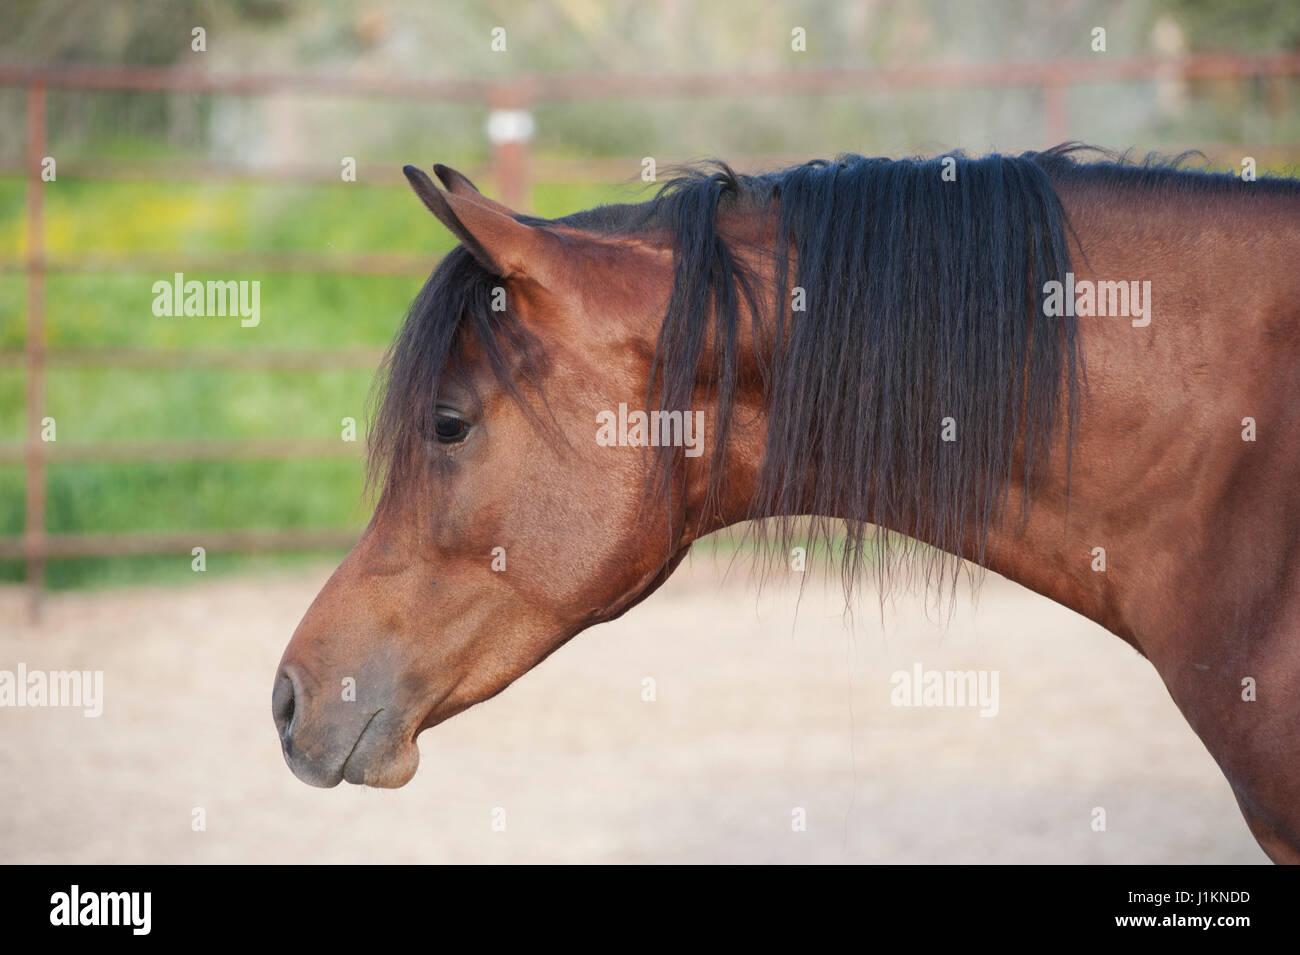 Arabian Bay Gelding Horse - Stock Image